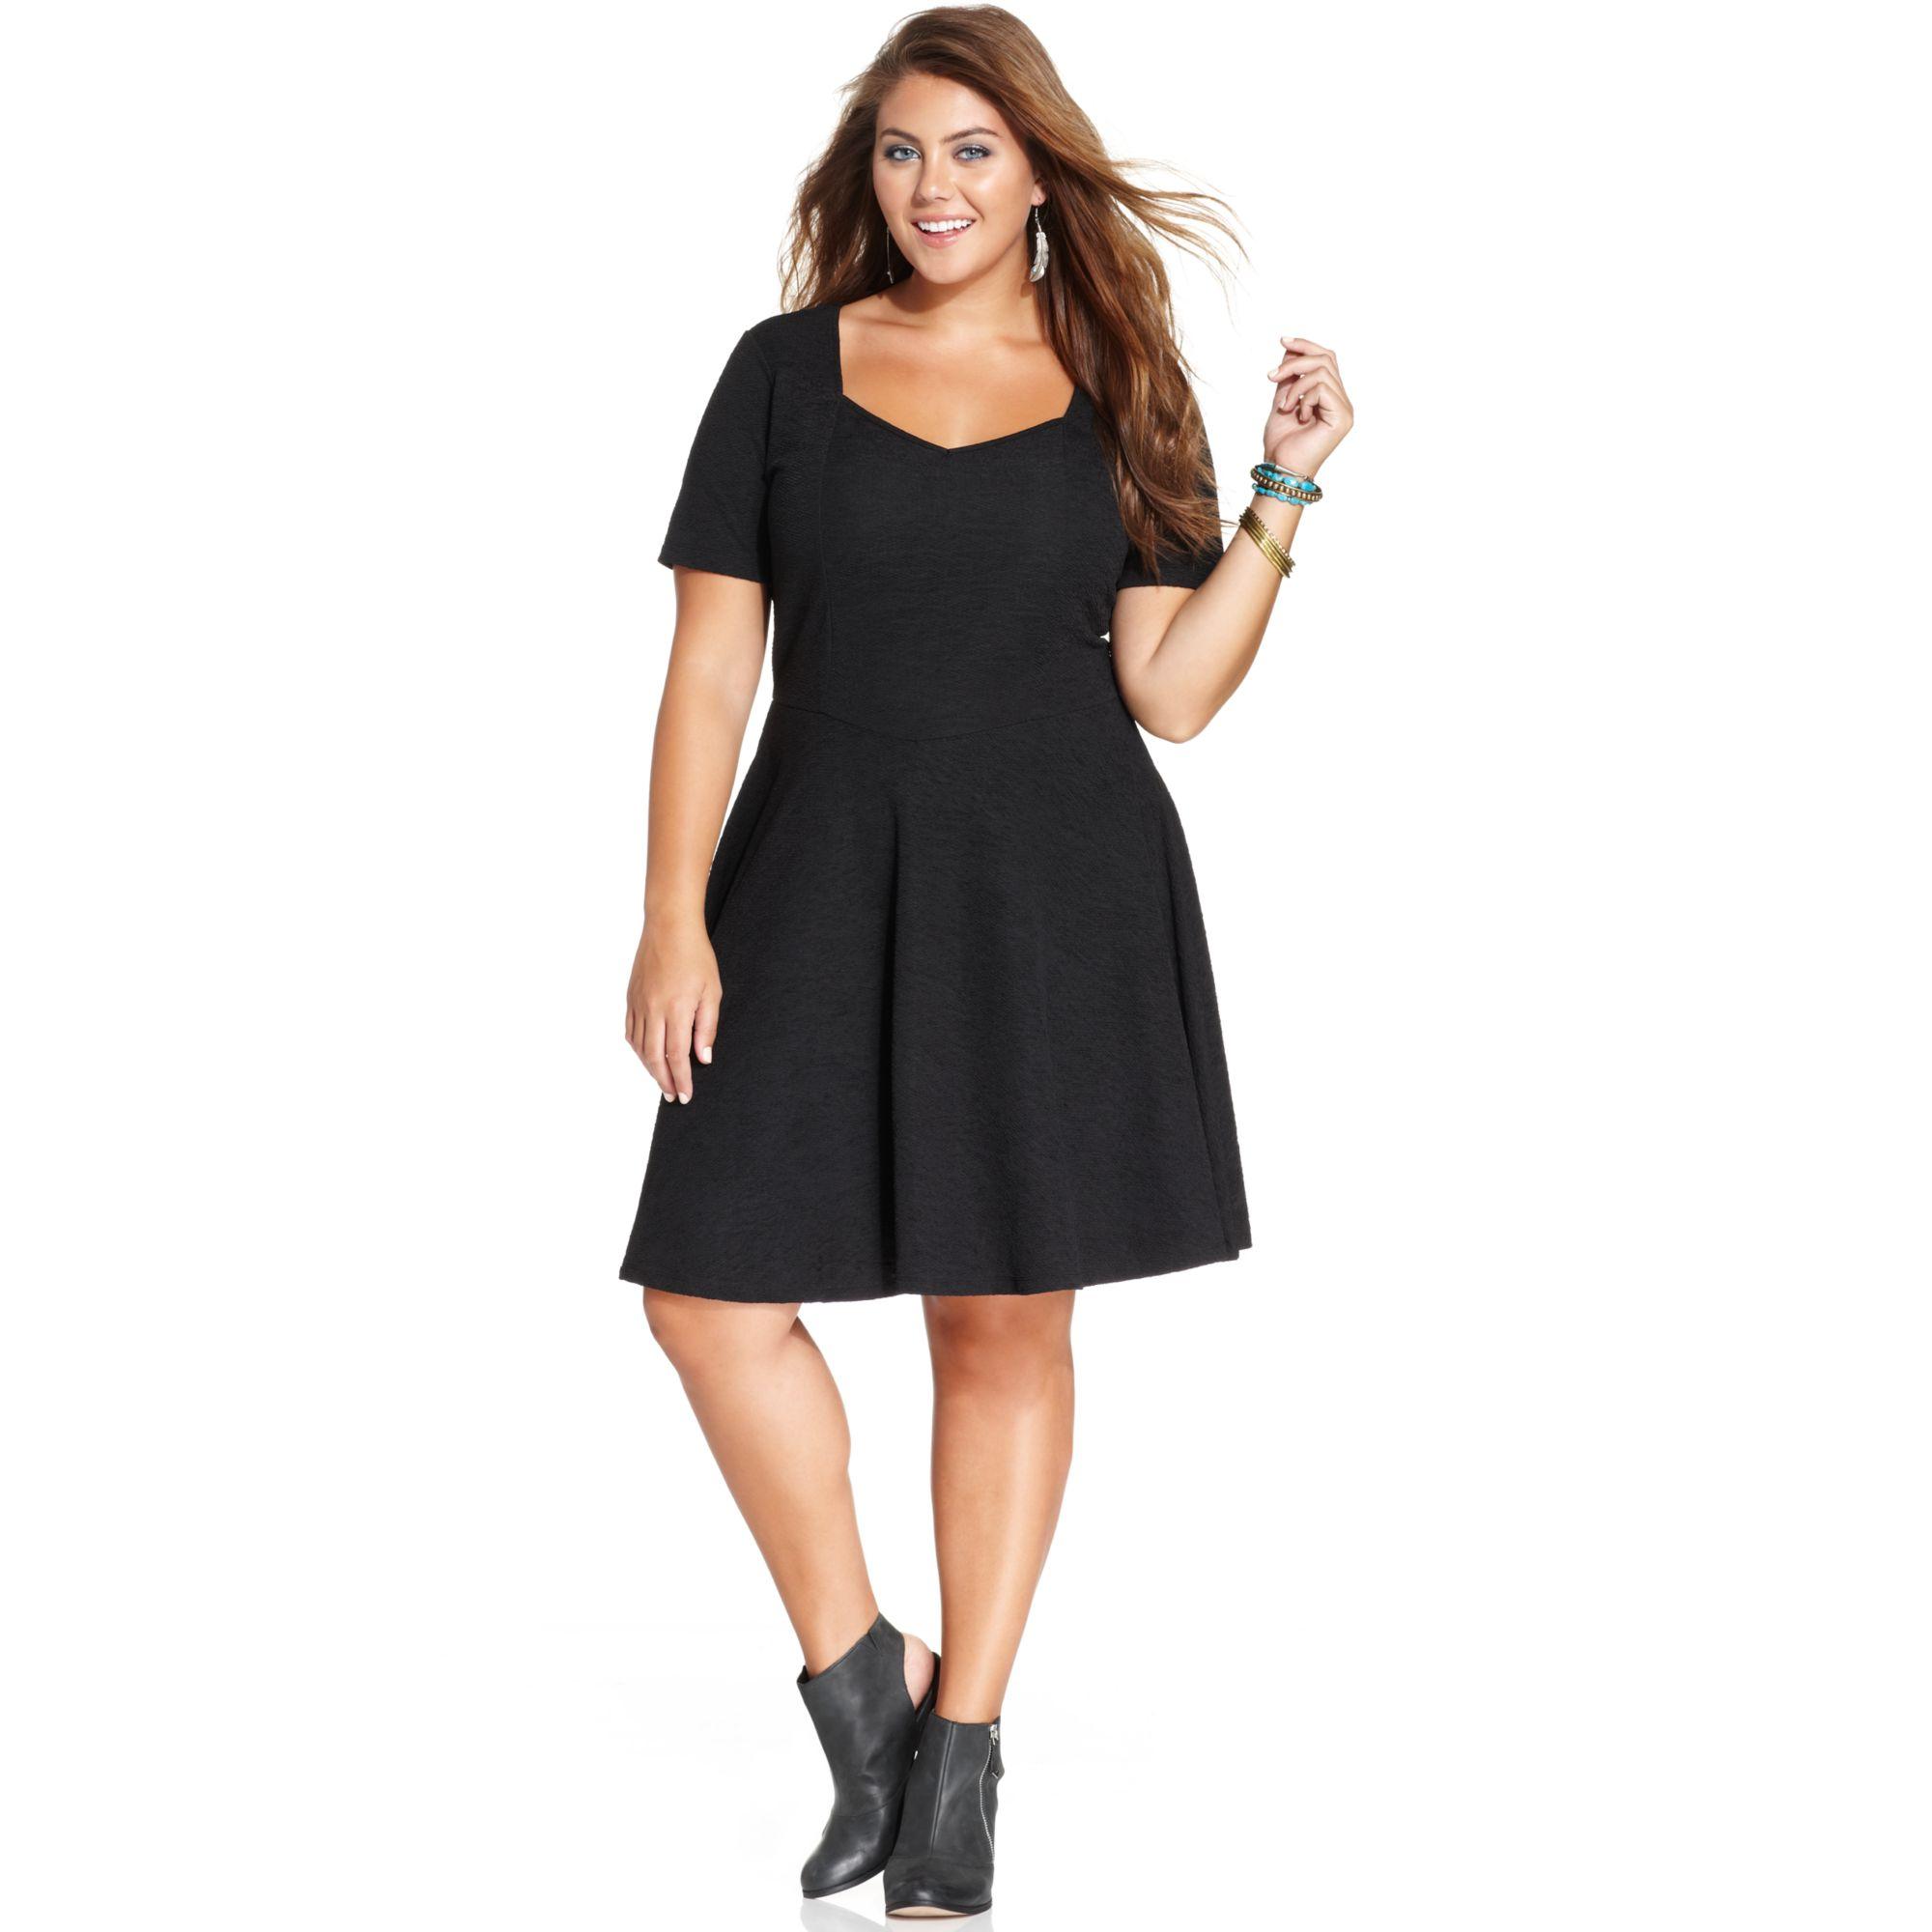 Plus Size Shortsleeve Textured Skater Dress